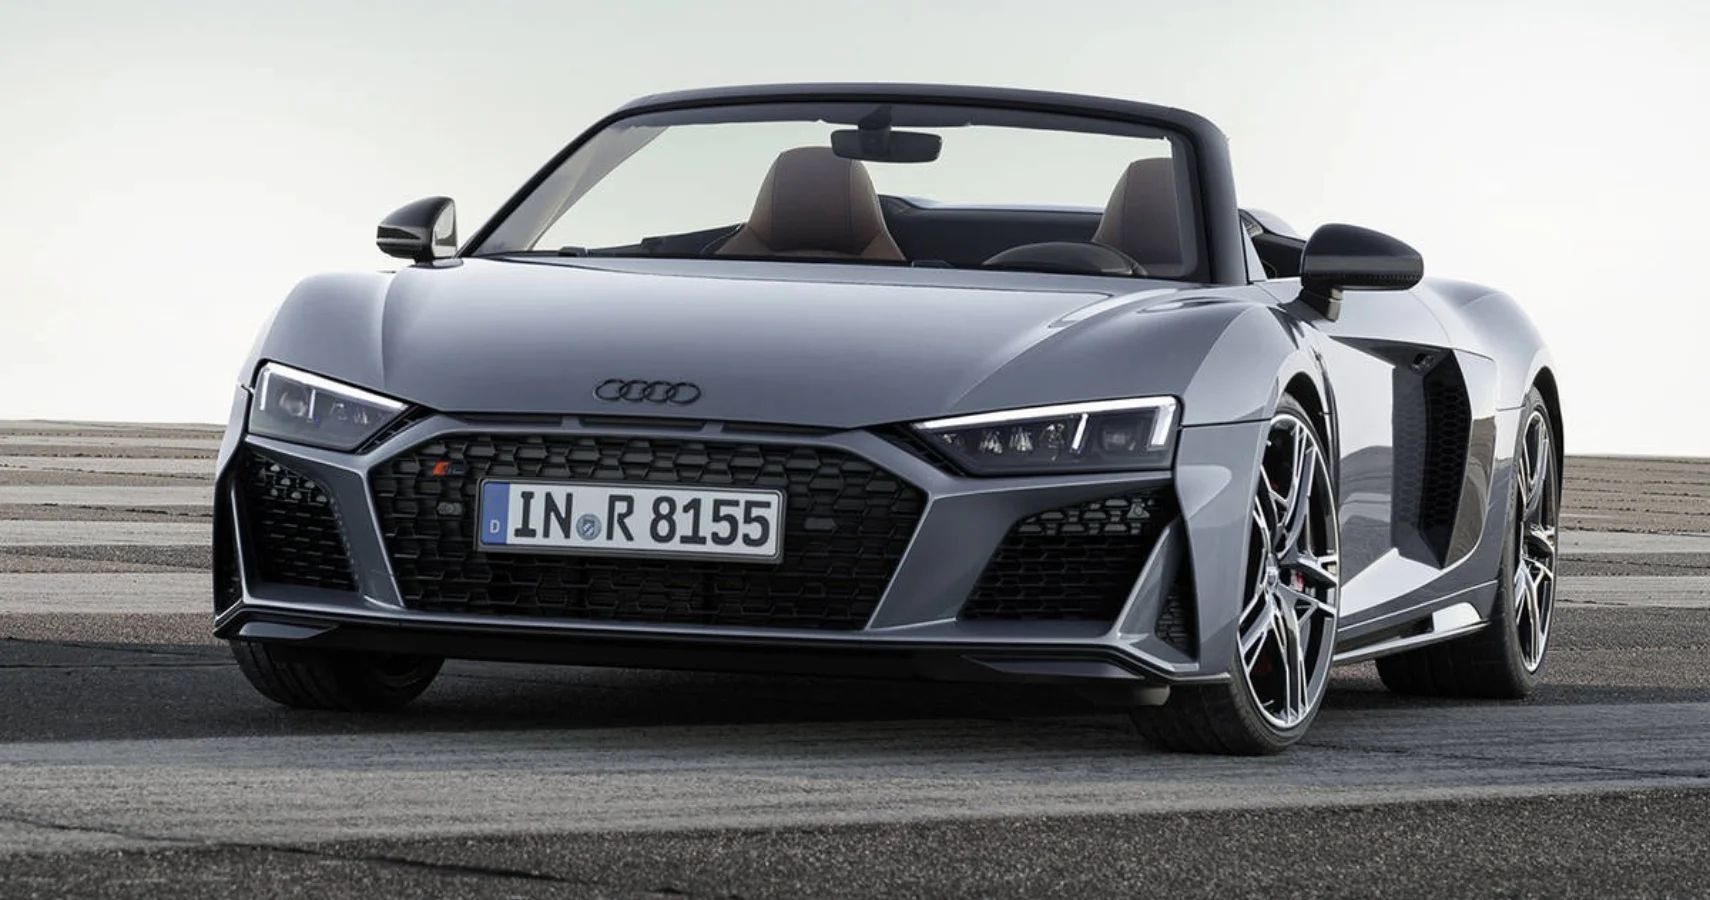 10 Best Audi Cars Ranked Hotcars